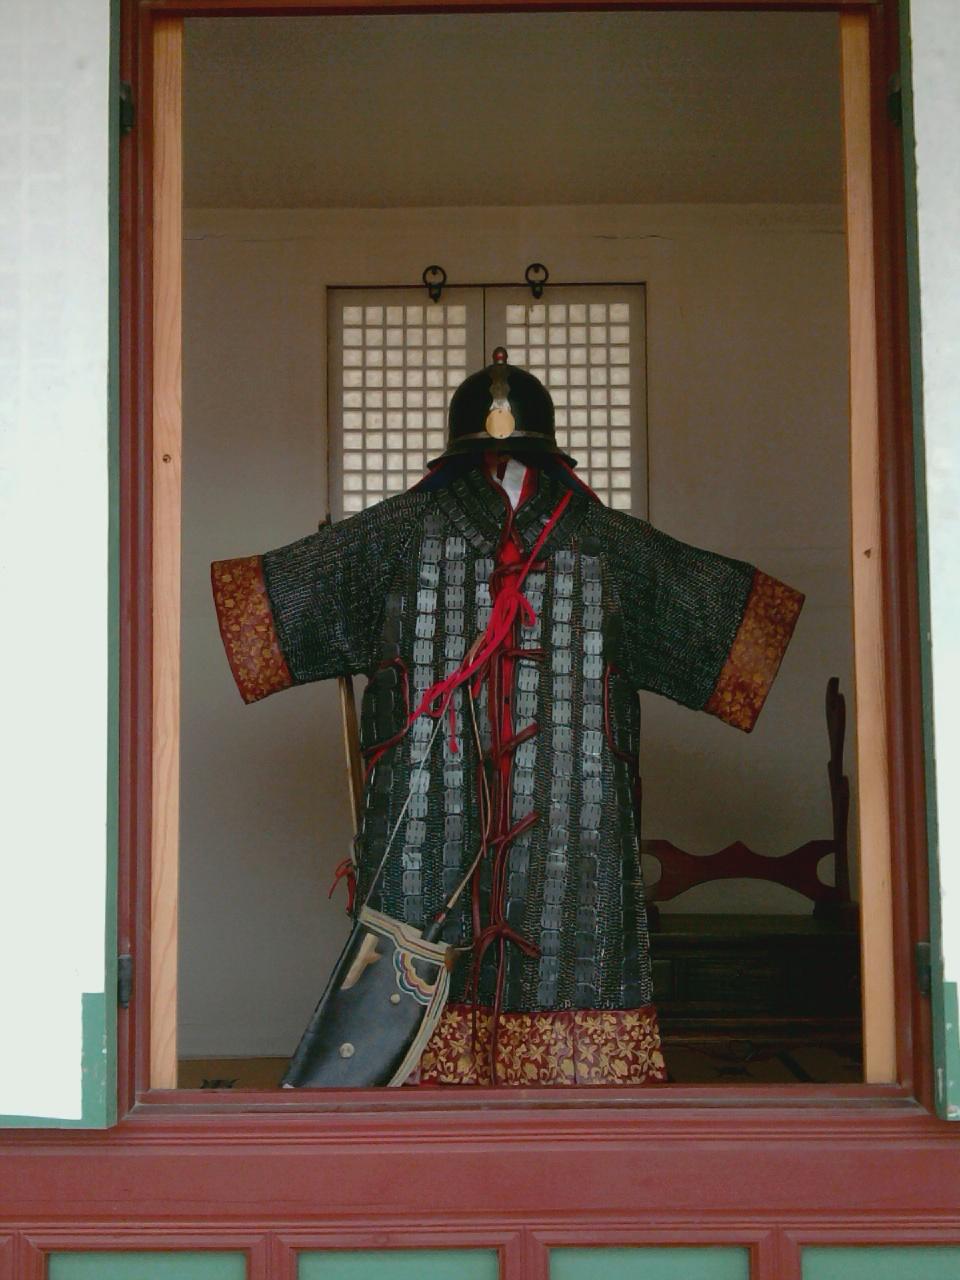 Joseon_plate_mail_in_Gyeongbokgung_Palace.jpg